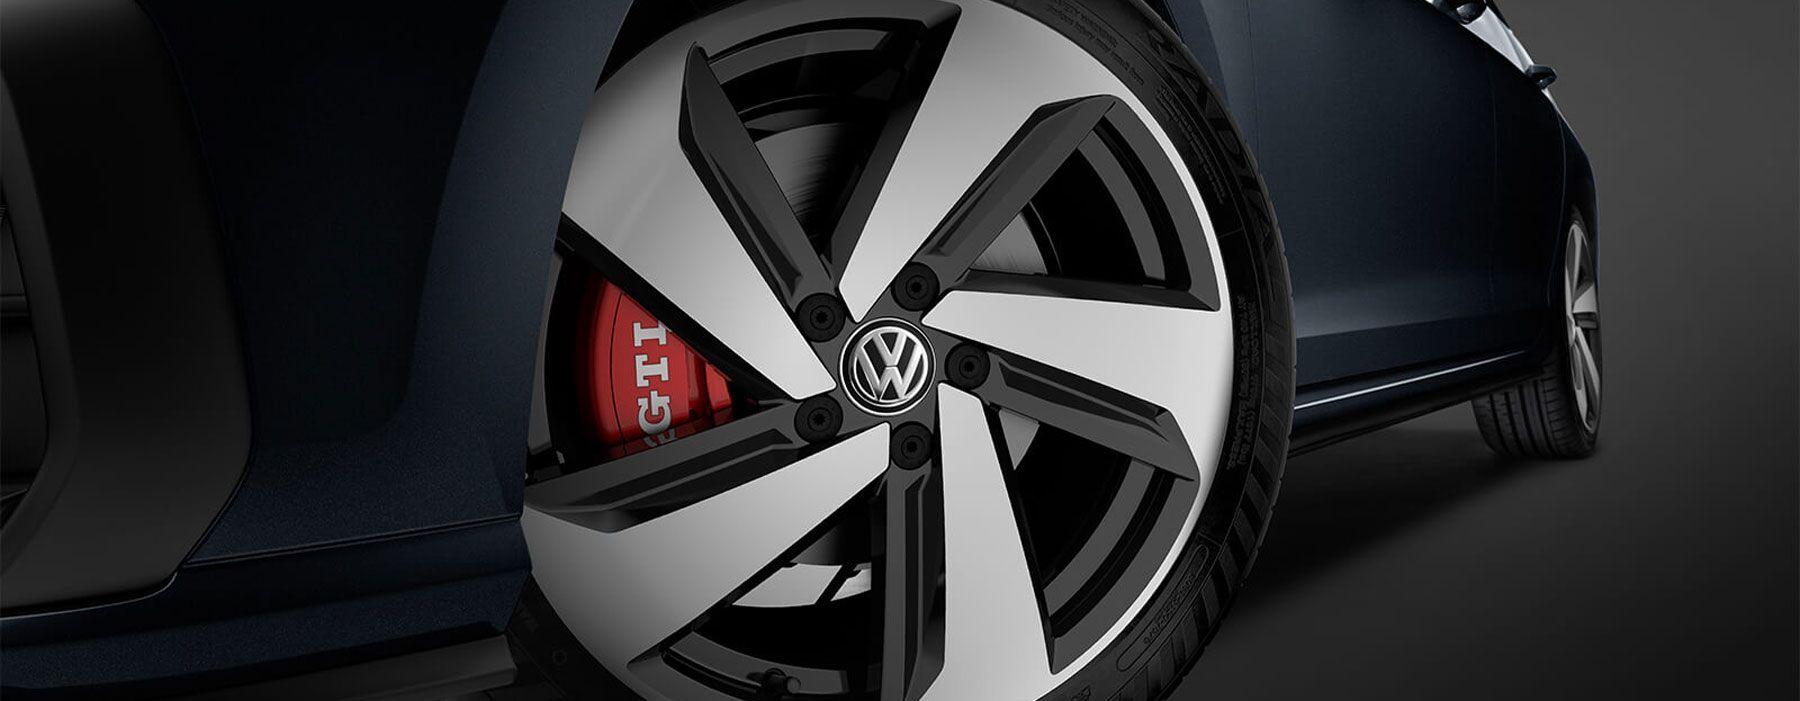 Volkswagen Golf GTI Alloy Wheels